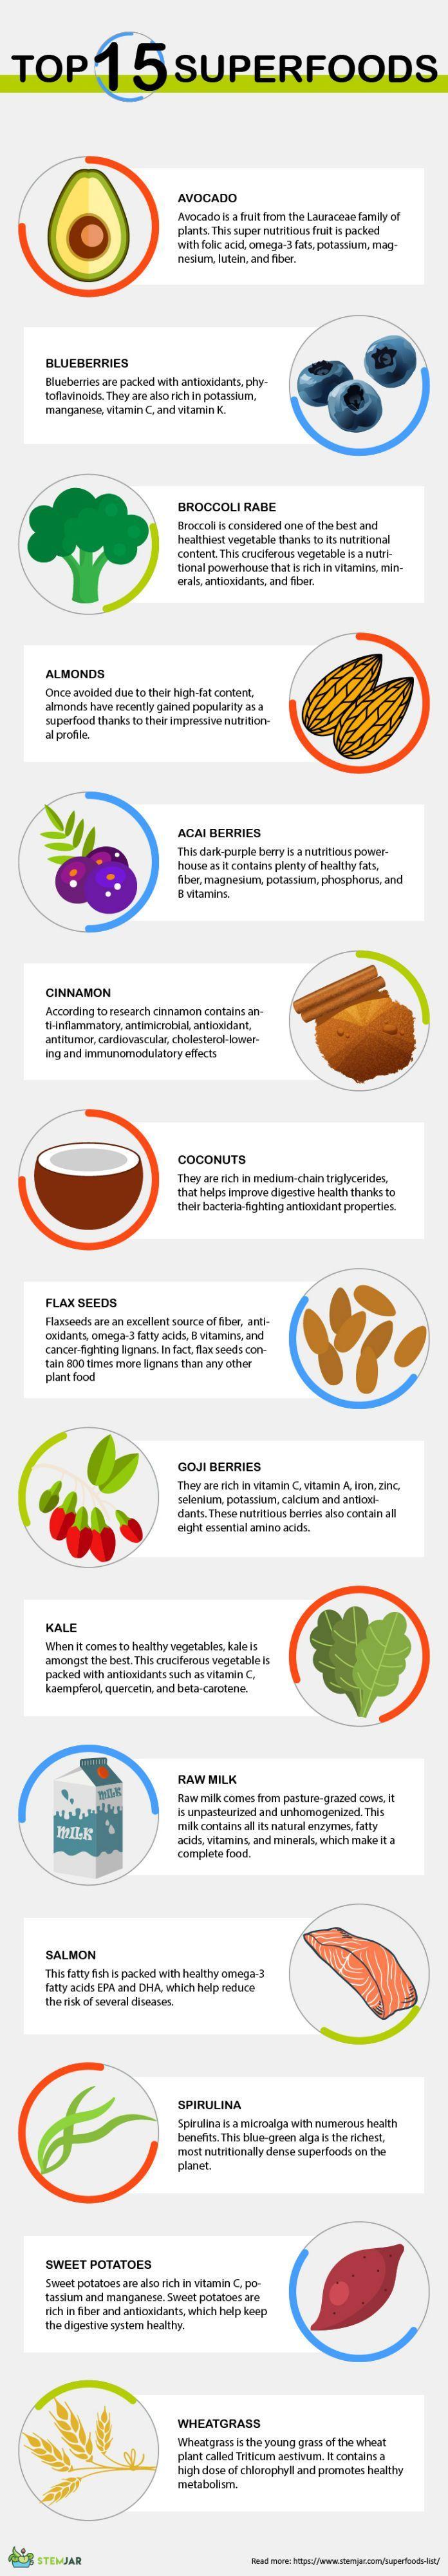 Top 15 Superfoods – Prevent Heart Ailments & Cancer -Stemjar